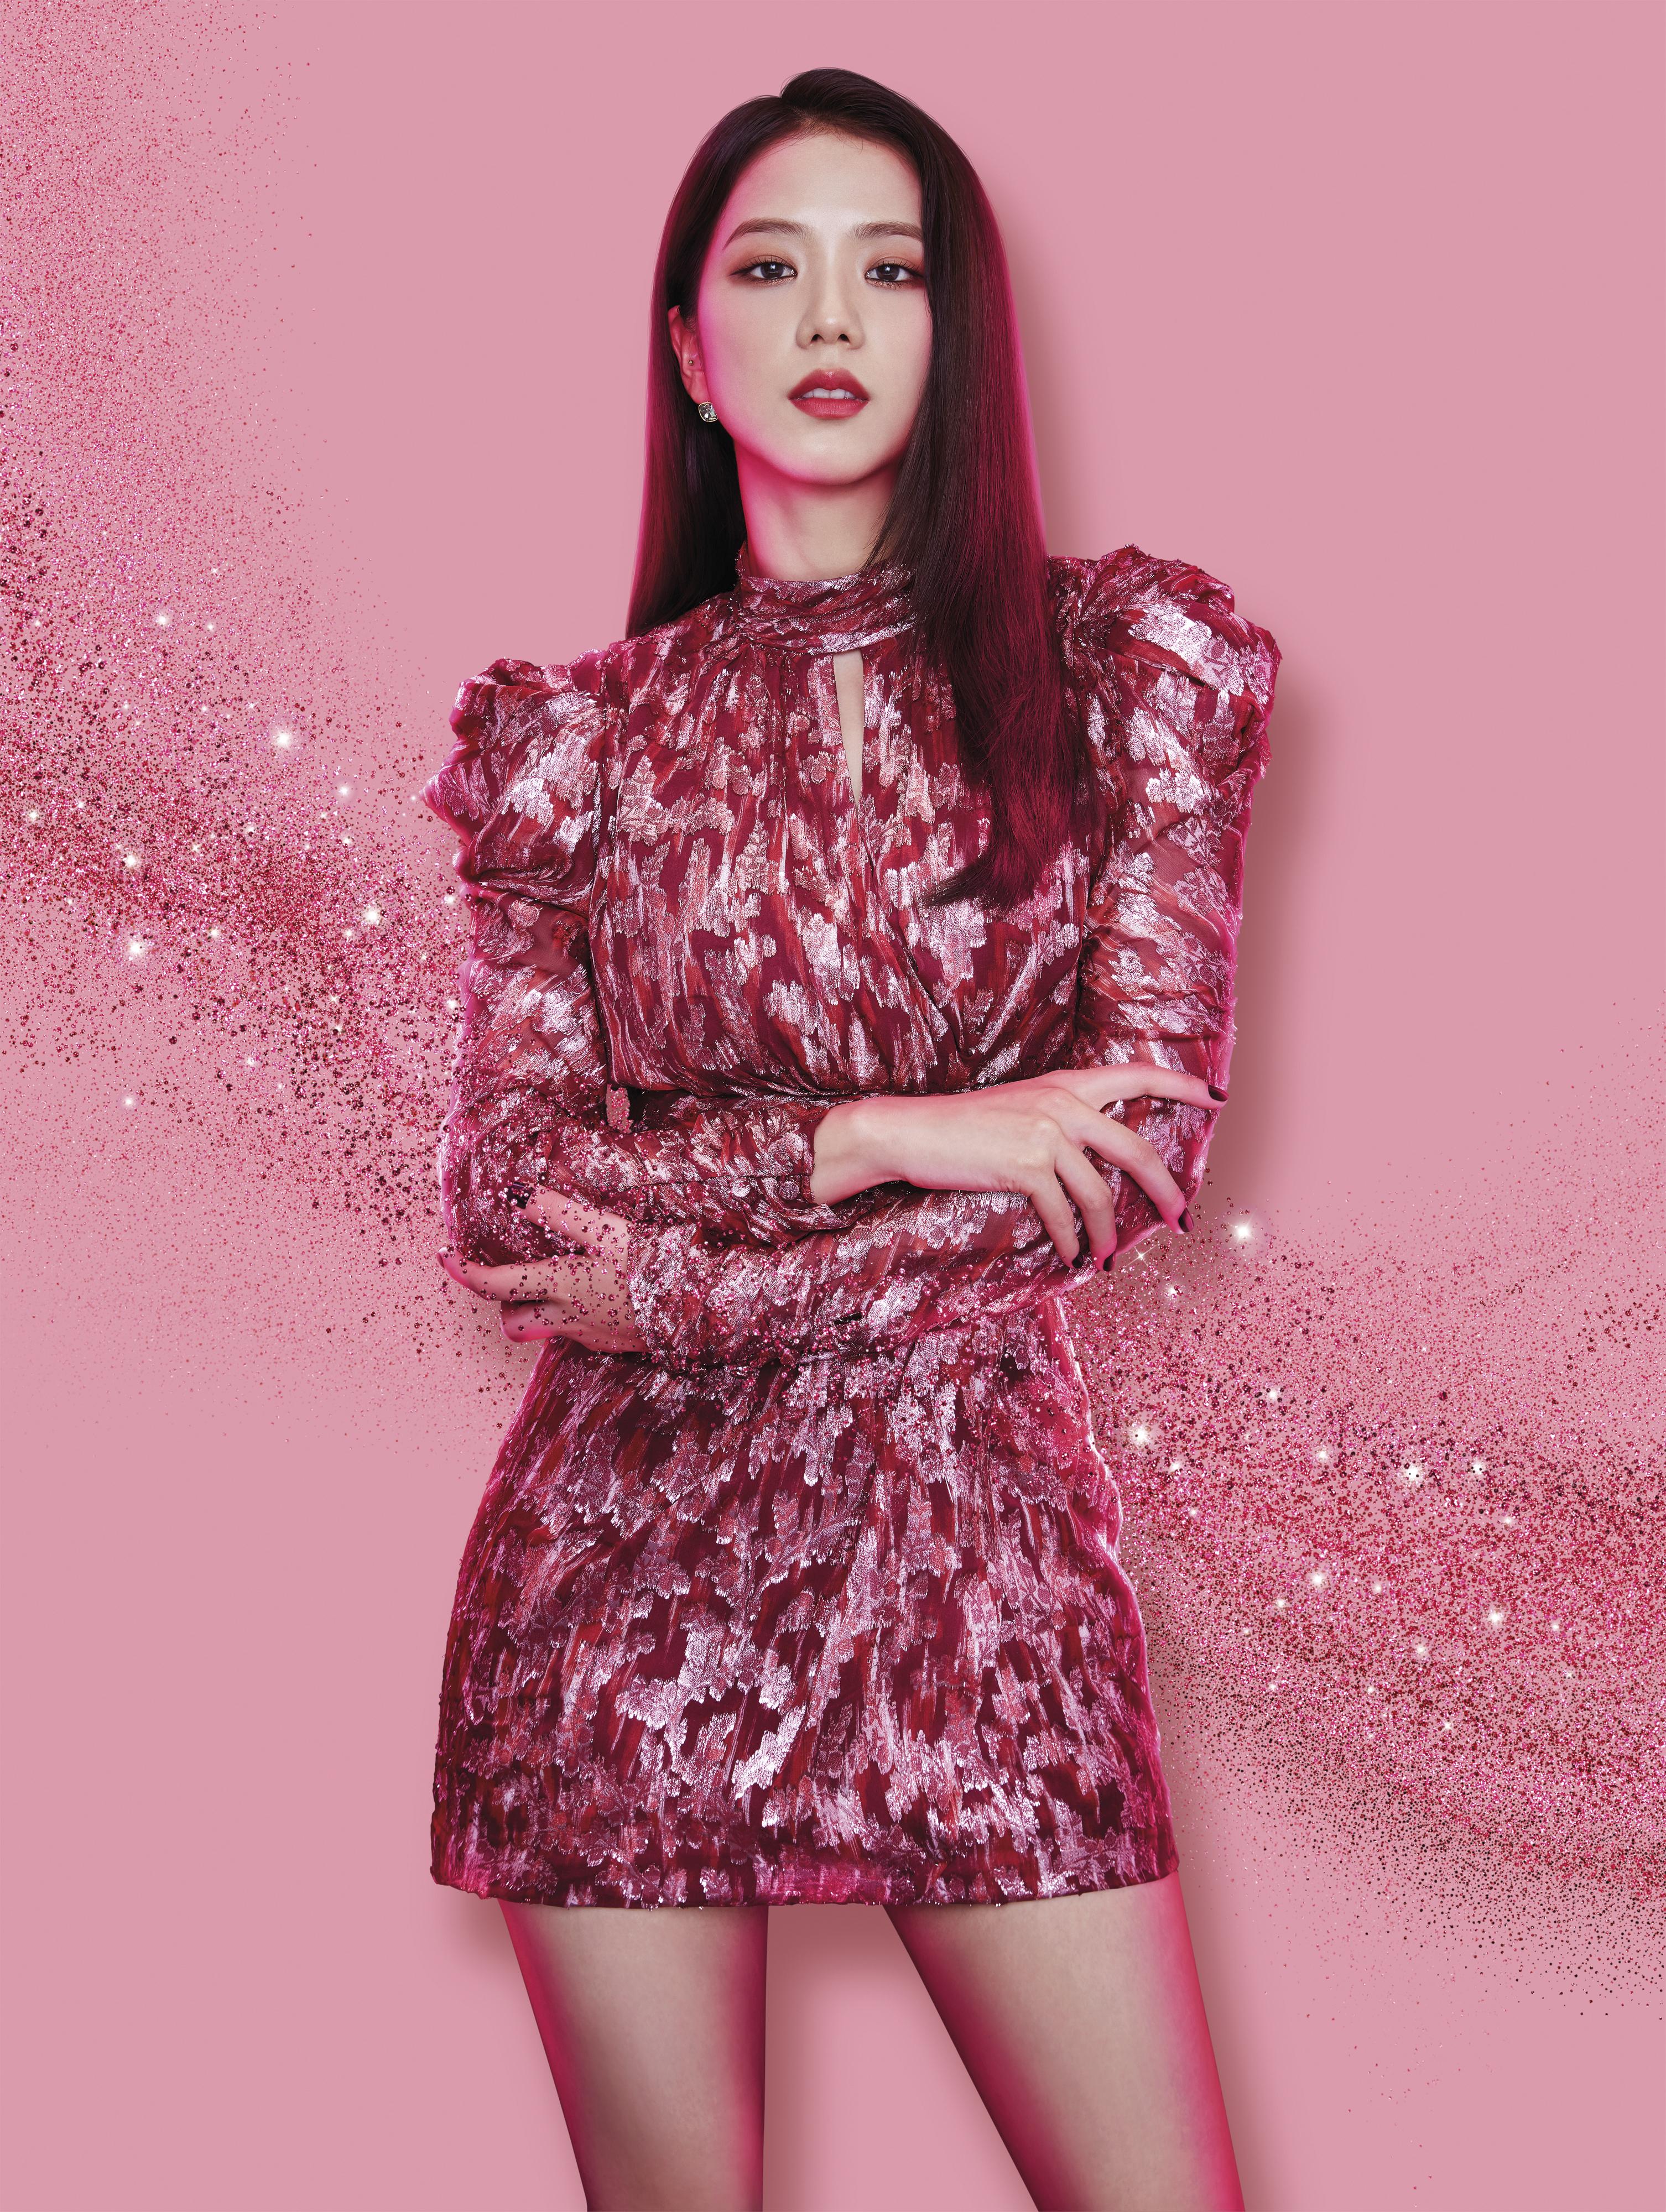 Hi-res_KBankxBLACKPINK_Jisoo_Pink_CMYK c